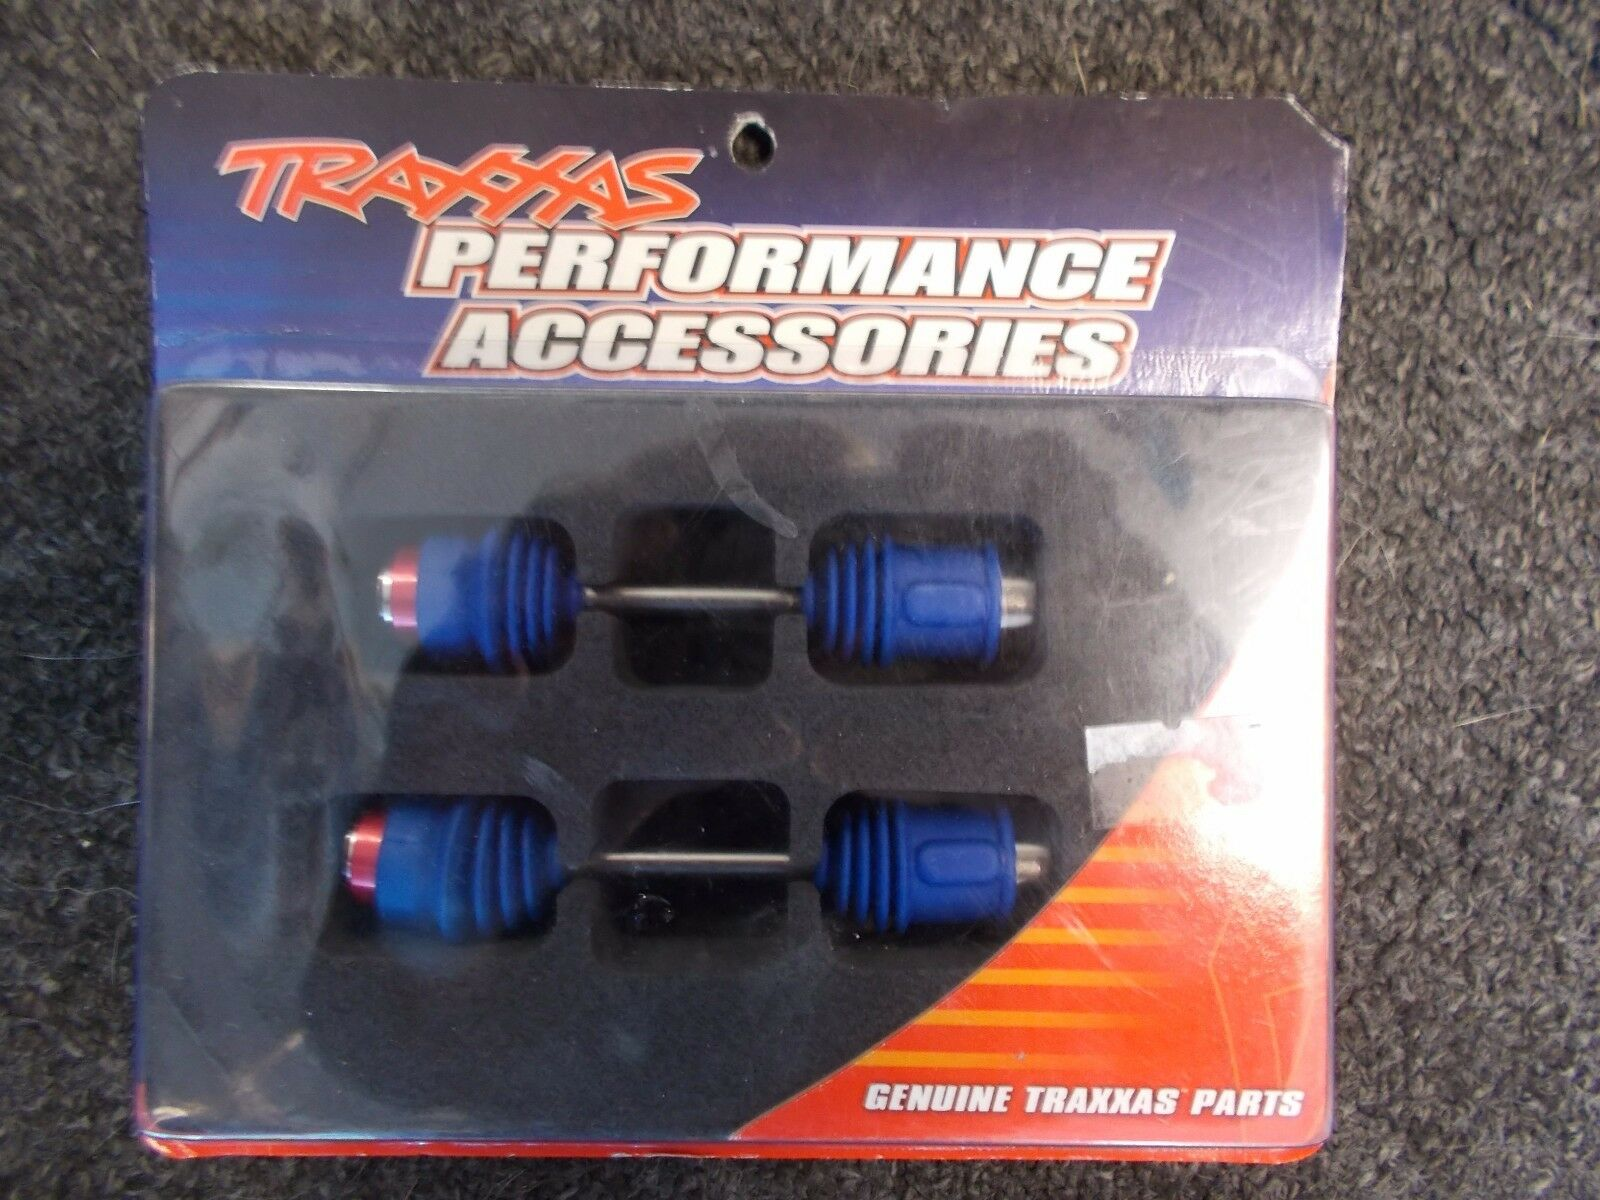 TRAXXAS Performance Accessories STERZI elettrici Center